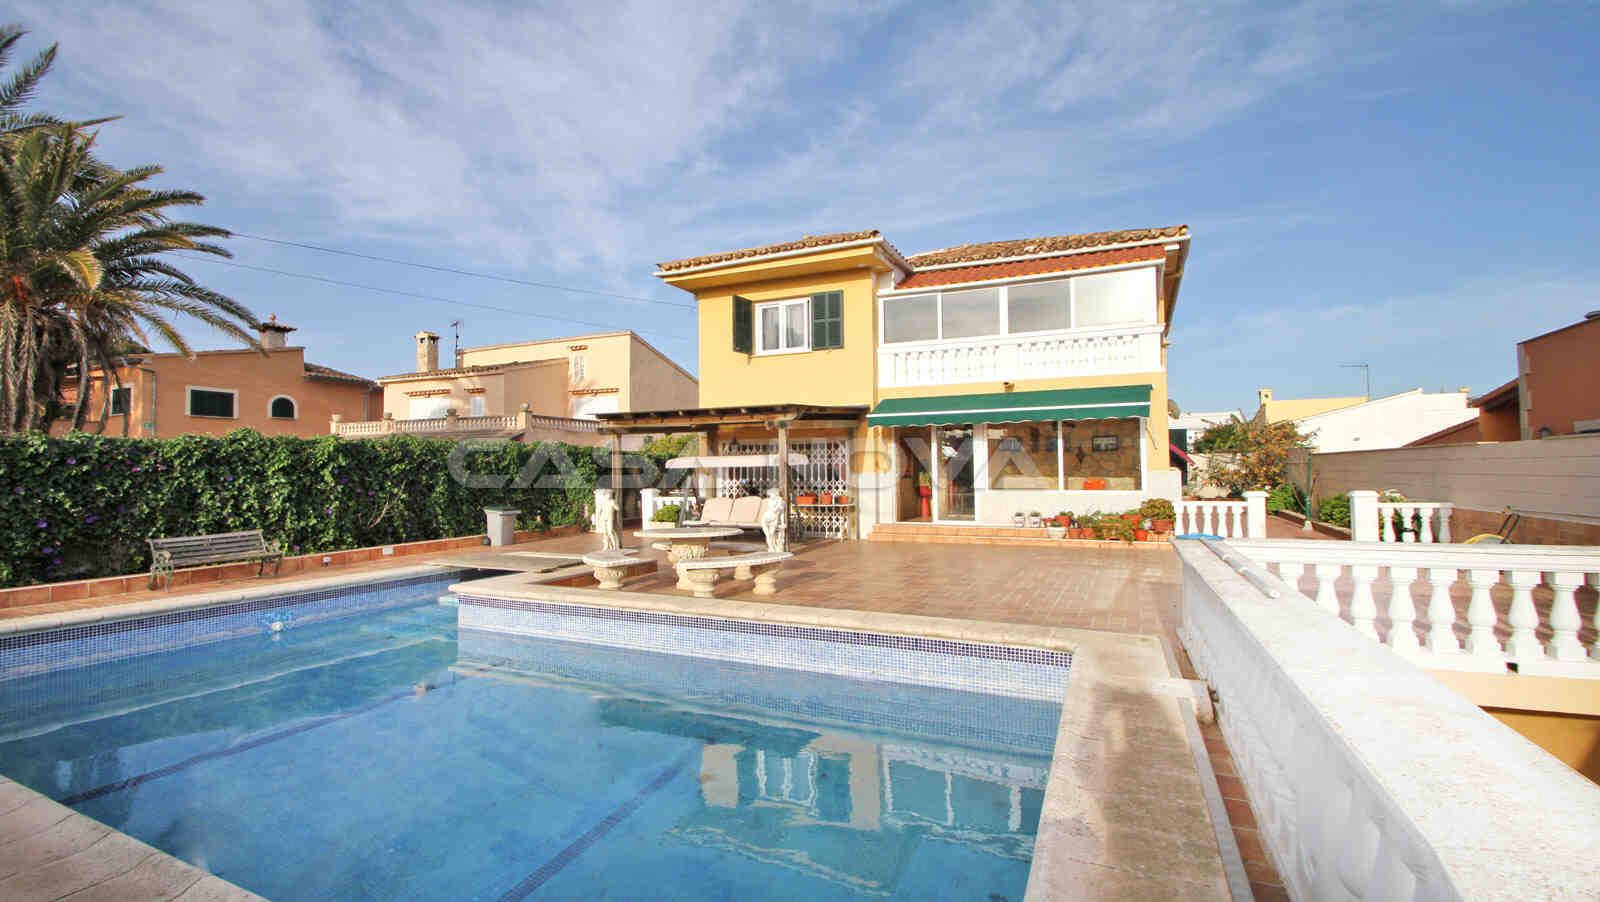 Haus mit Pool in El Toro